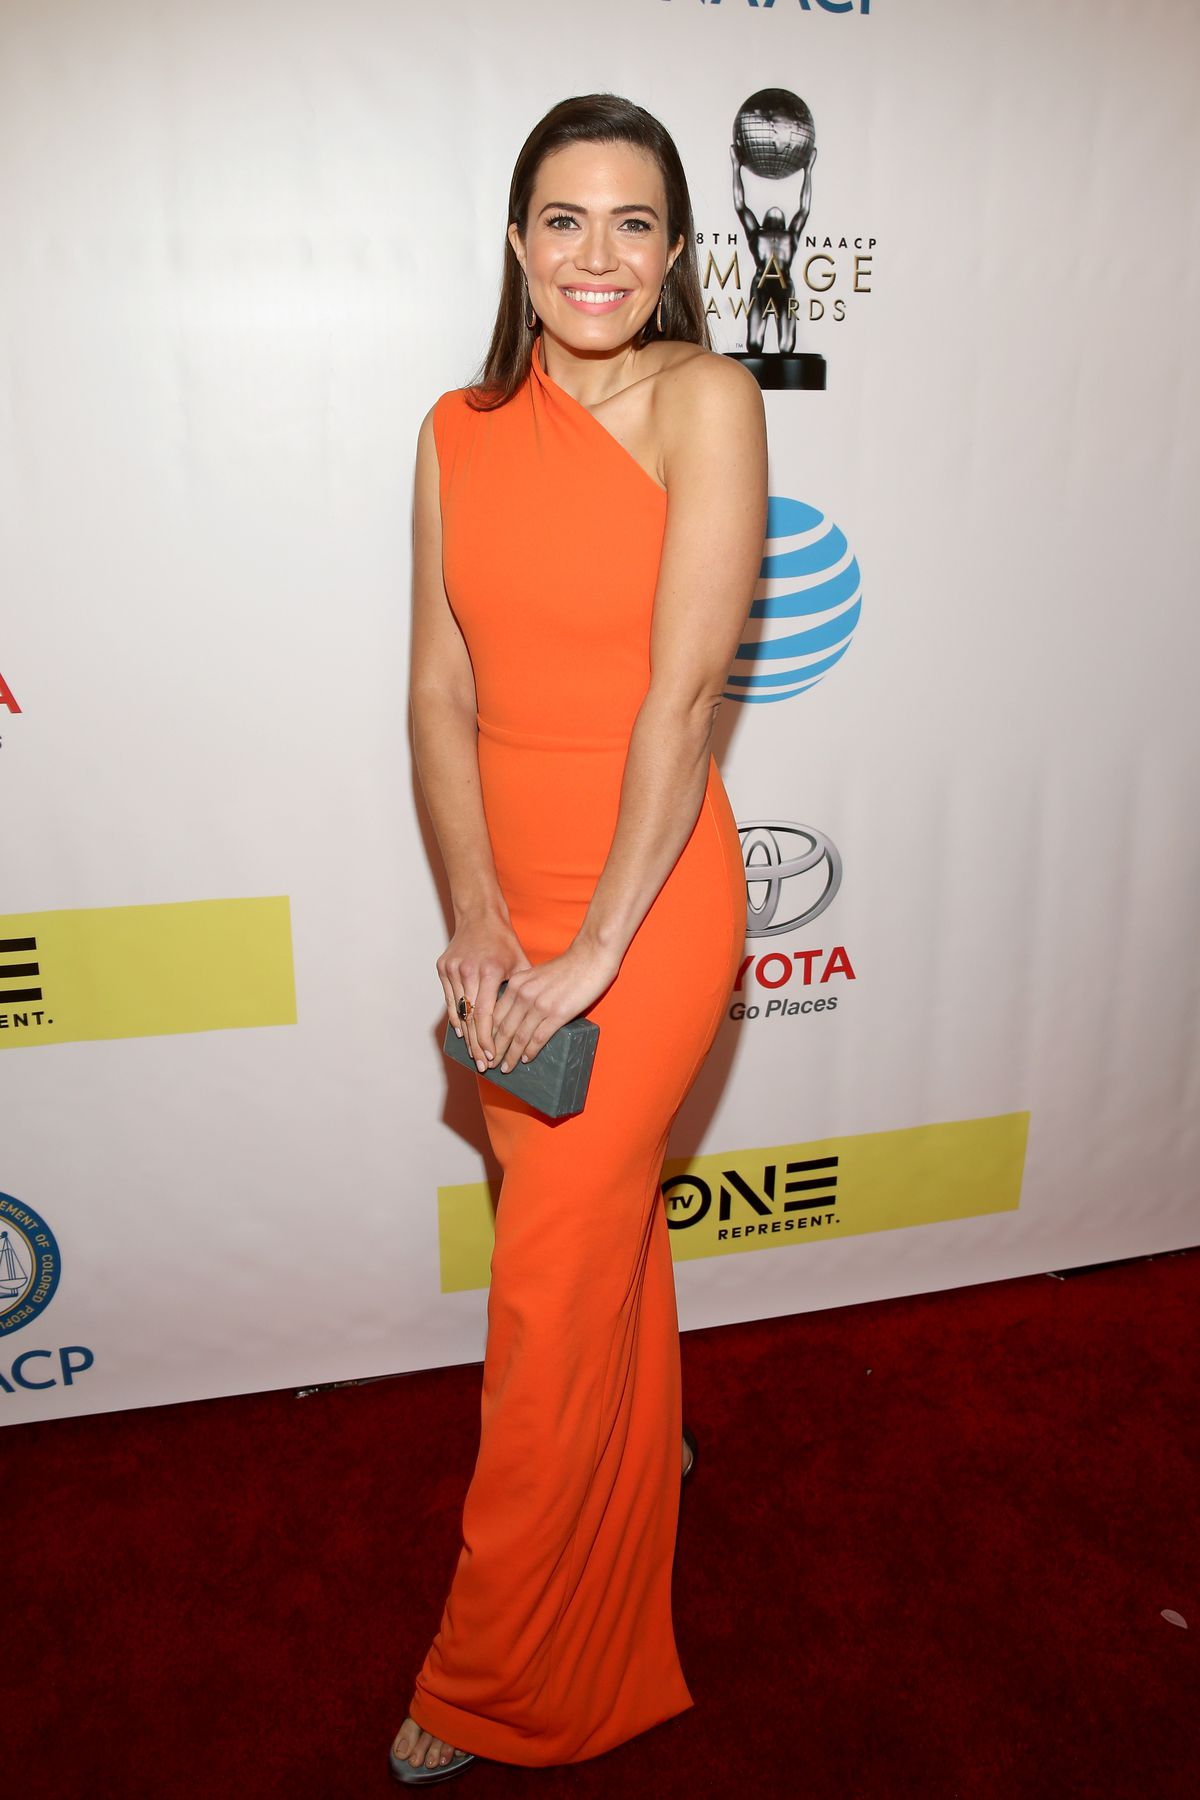 Actress Mandy Moore attends the 48th NAACP Image Awards at Pasadena Civic Auditorium on February 11, 2017 in Pasadena, California.